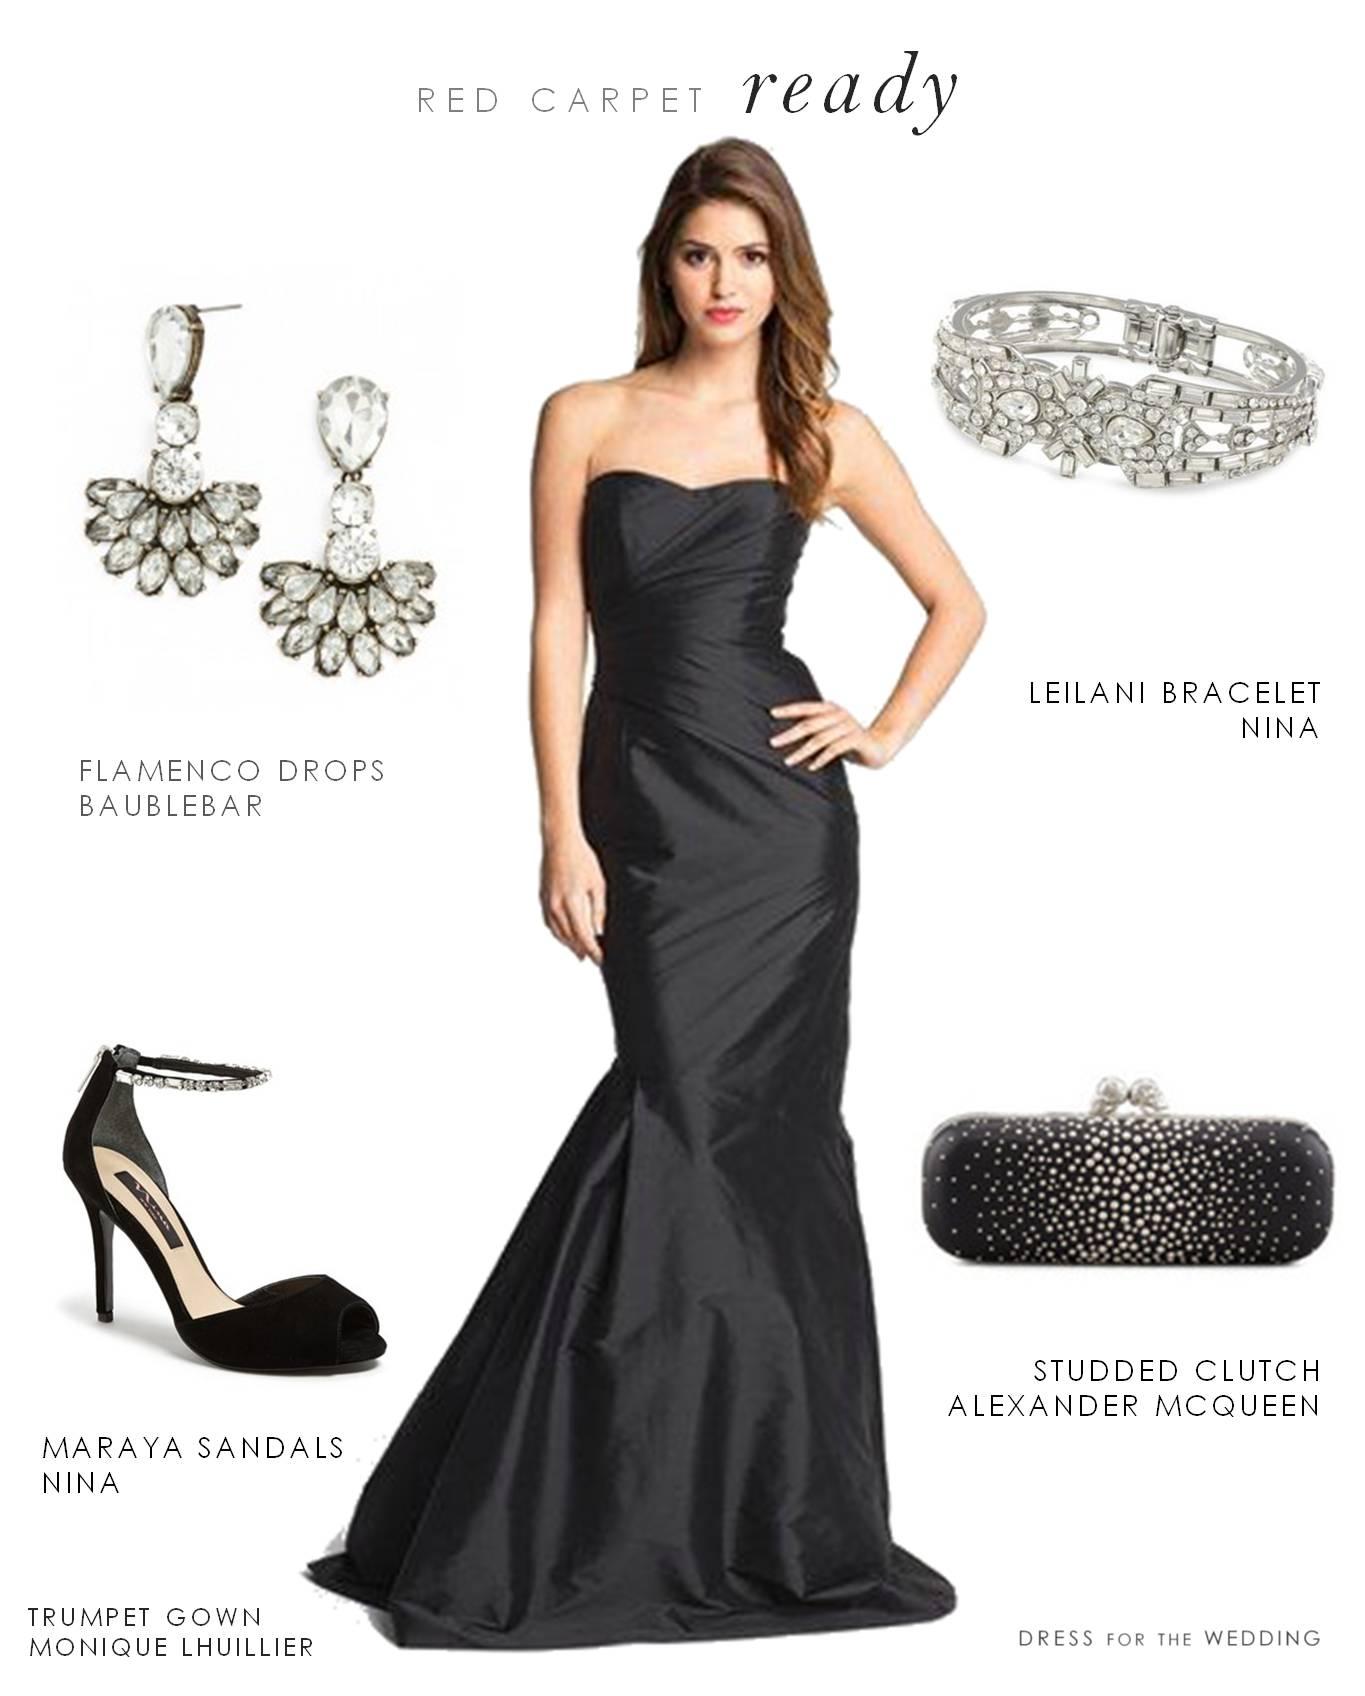 Formal Attire: Black Strapless Formal Gown